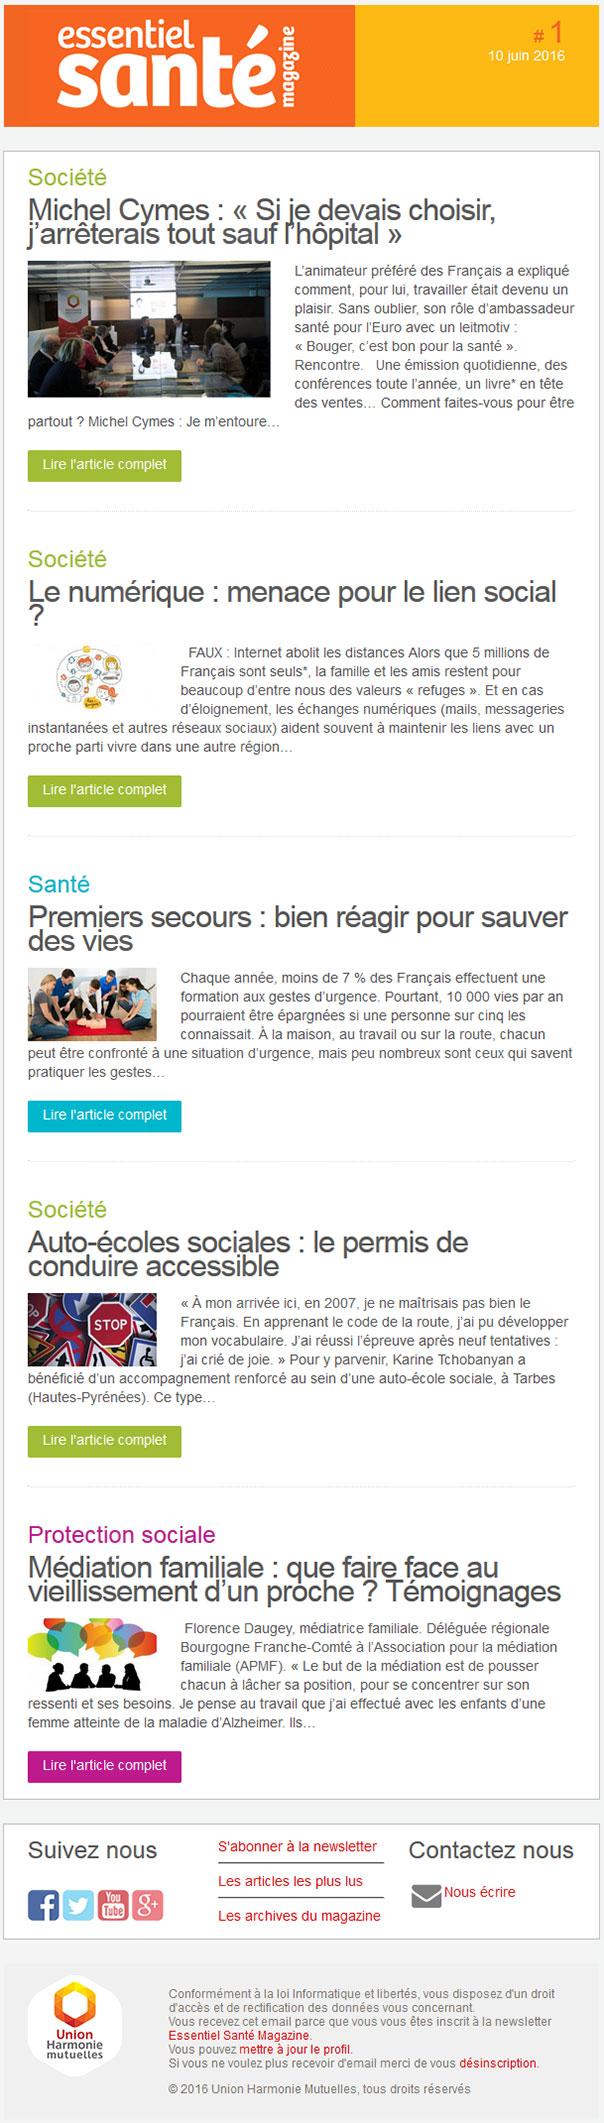 news-esm